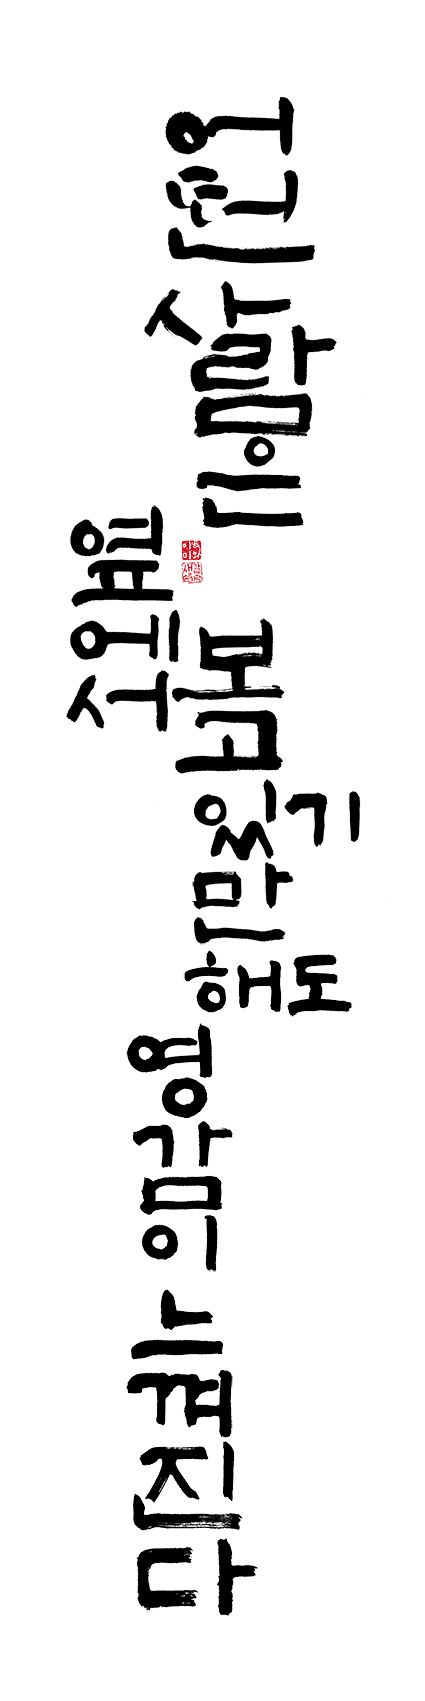 calligraphy_어떤 사람은 옆에서 보고 있기만 해도 영감이 느껴진다<프레임>